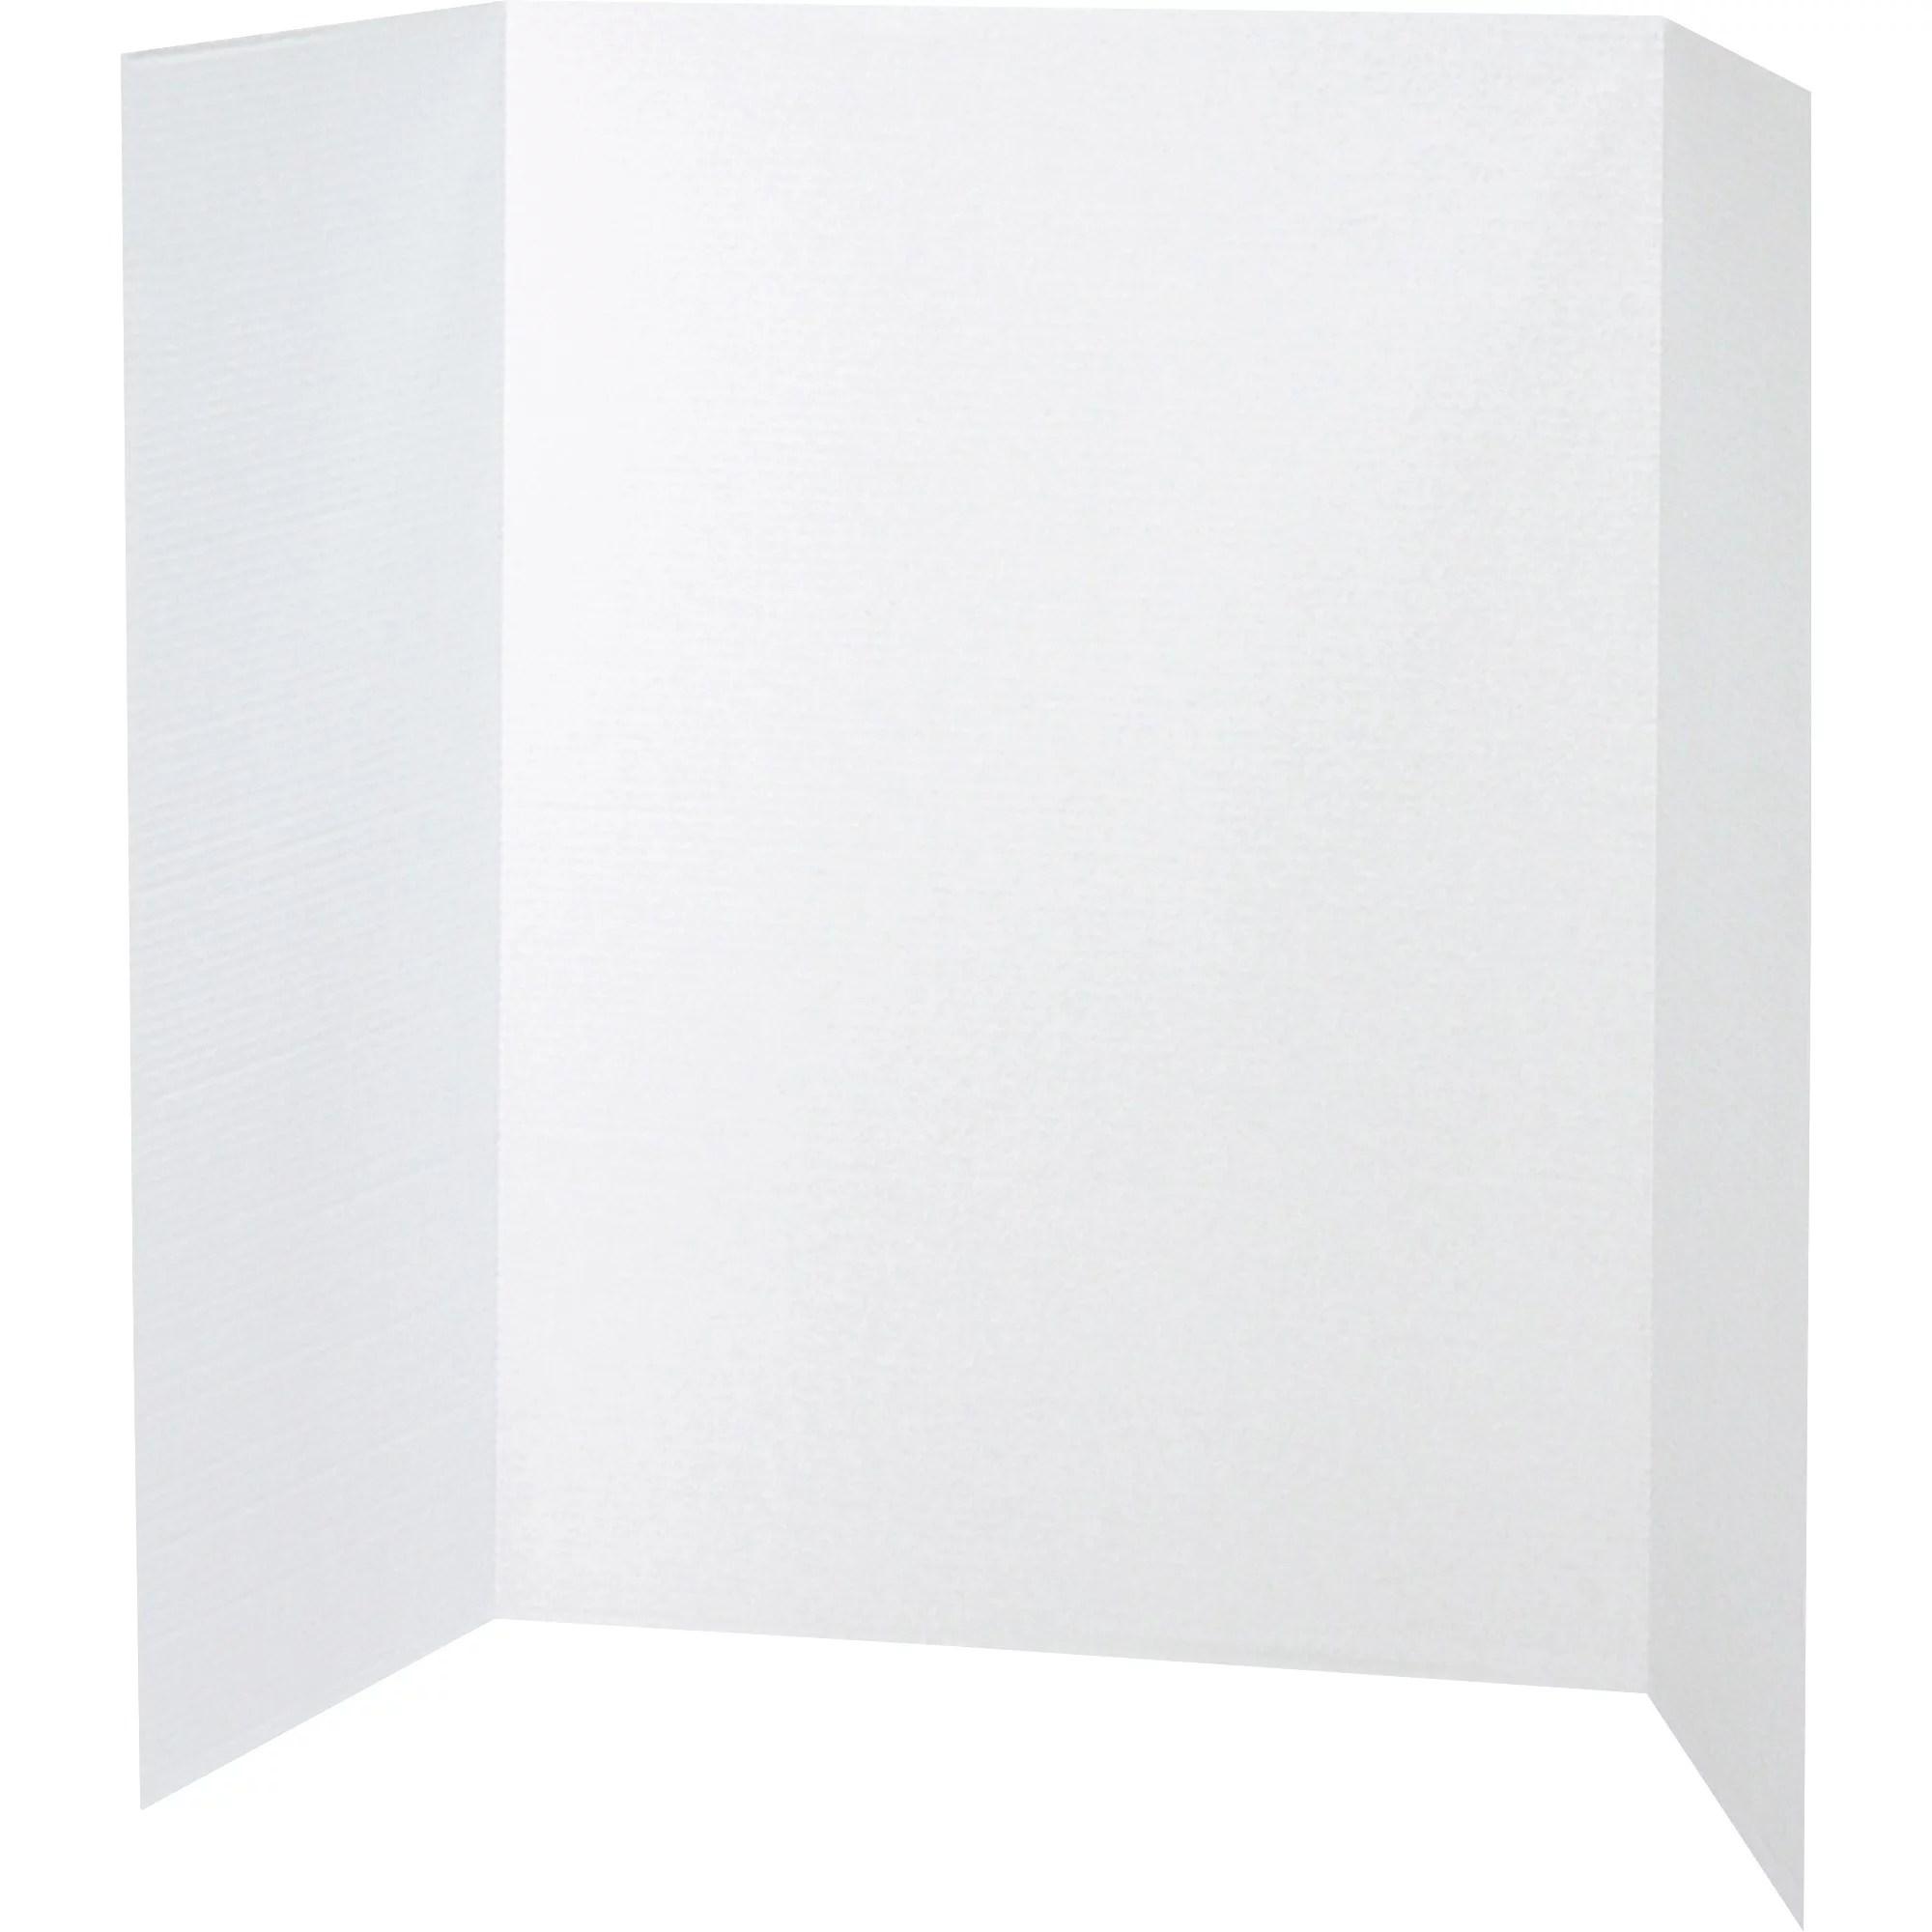 pacon tri fold display boards 40 x 28 white 8 carton